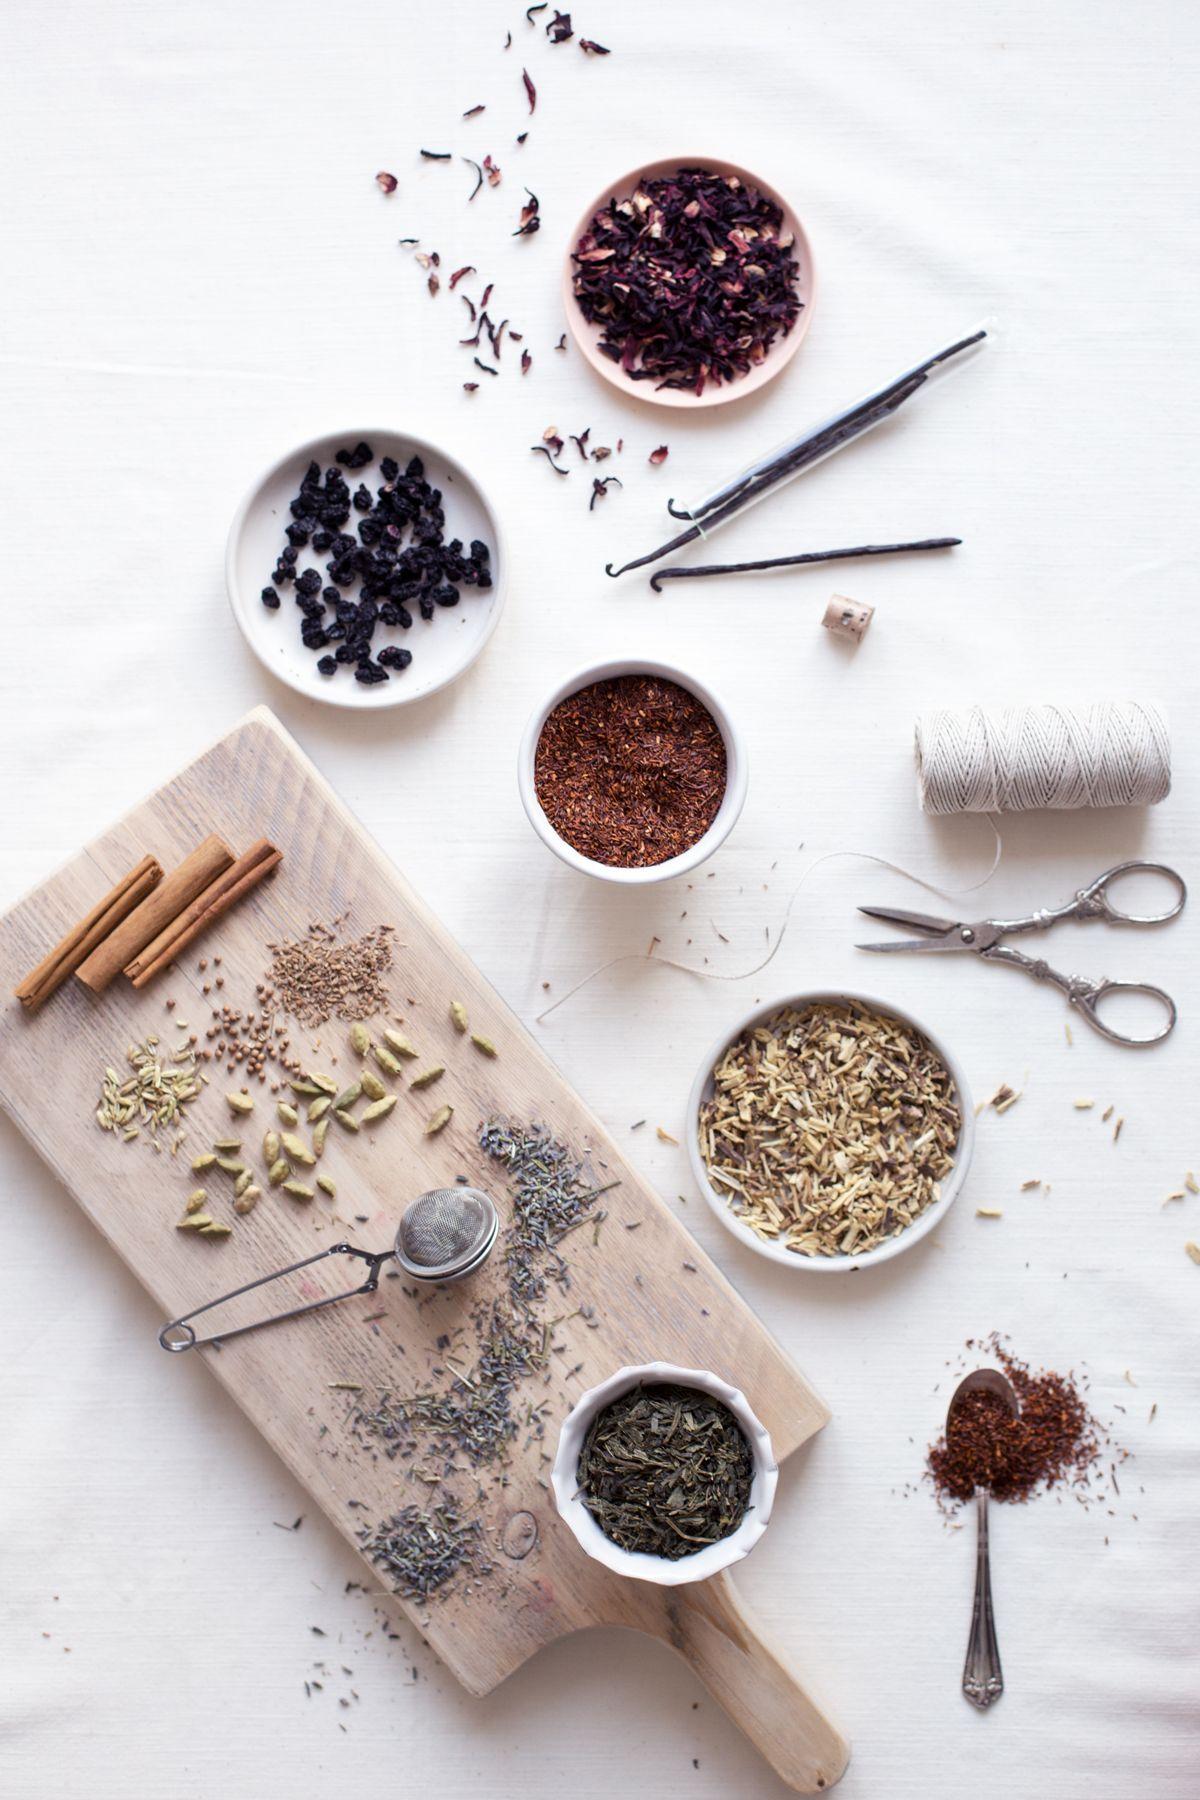 Bulk herbs spices organic organic herbal tea - Tea Herbs Spices For Making Tea Blends Make Your Own Tea Blend